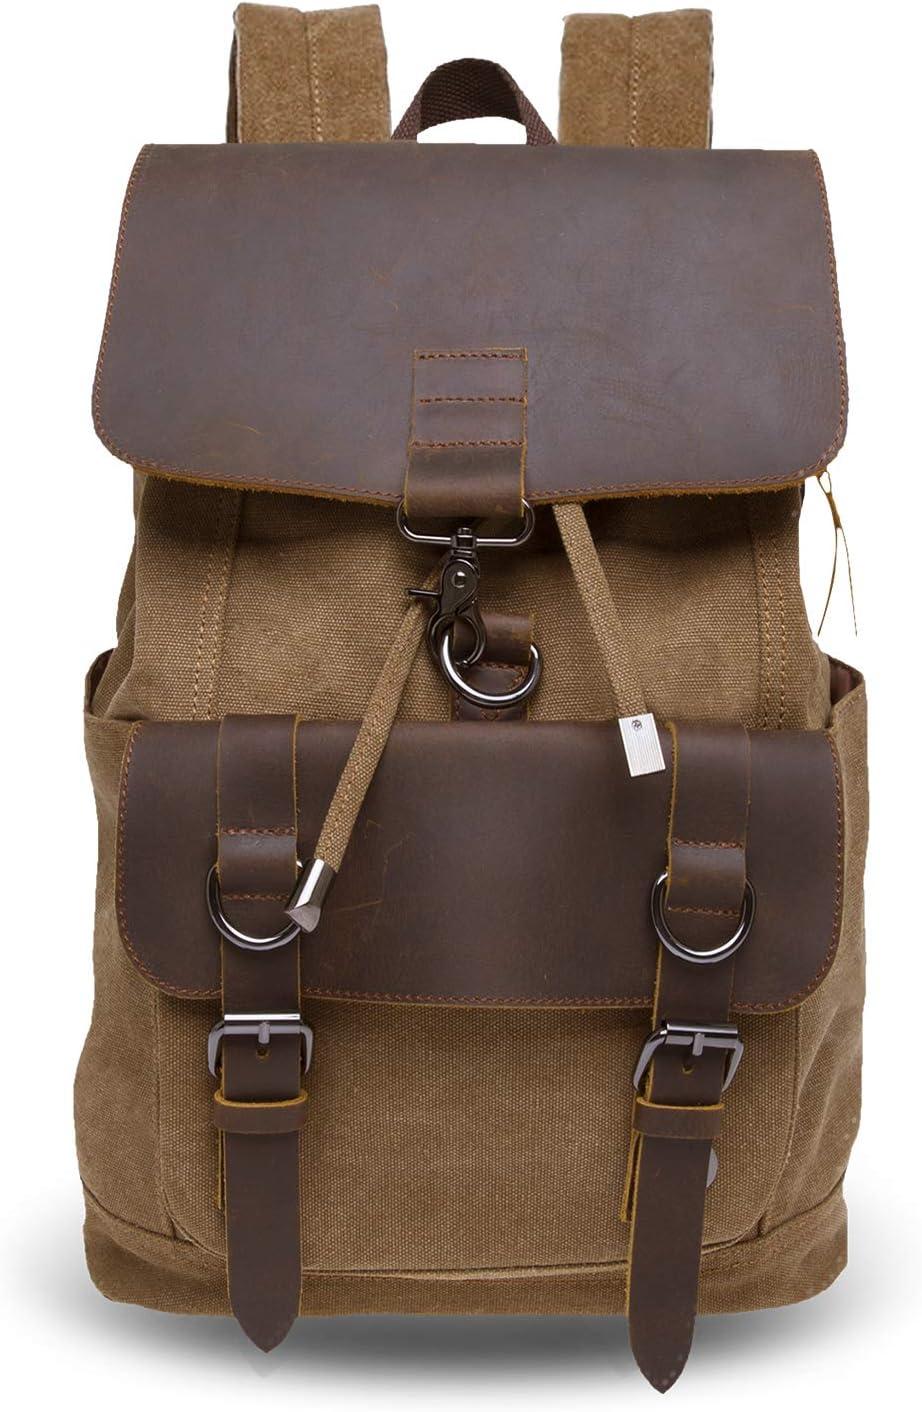 Vintage Canvas Backpack for Men, Casual Bookbag for School Travel Hiking 25L, Fit 15.6 Laptop